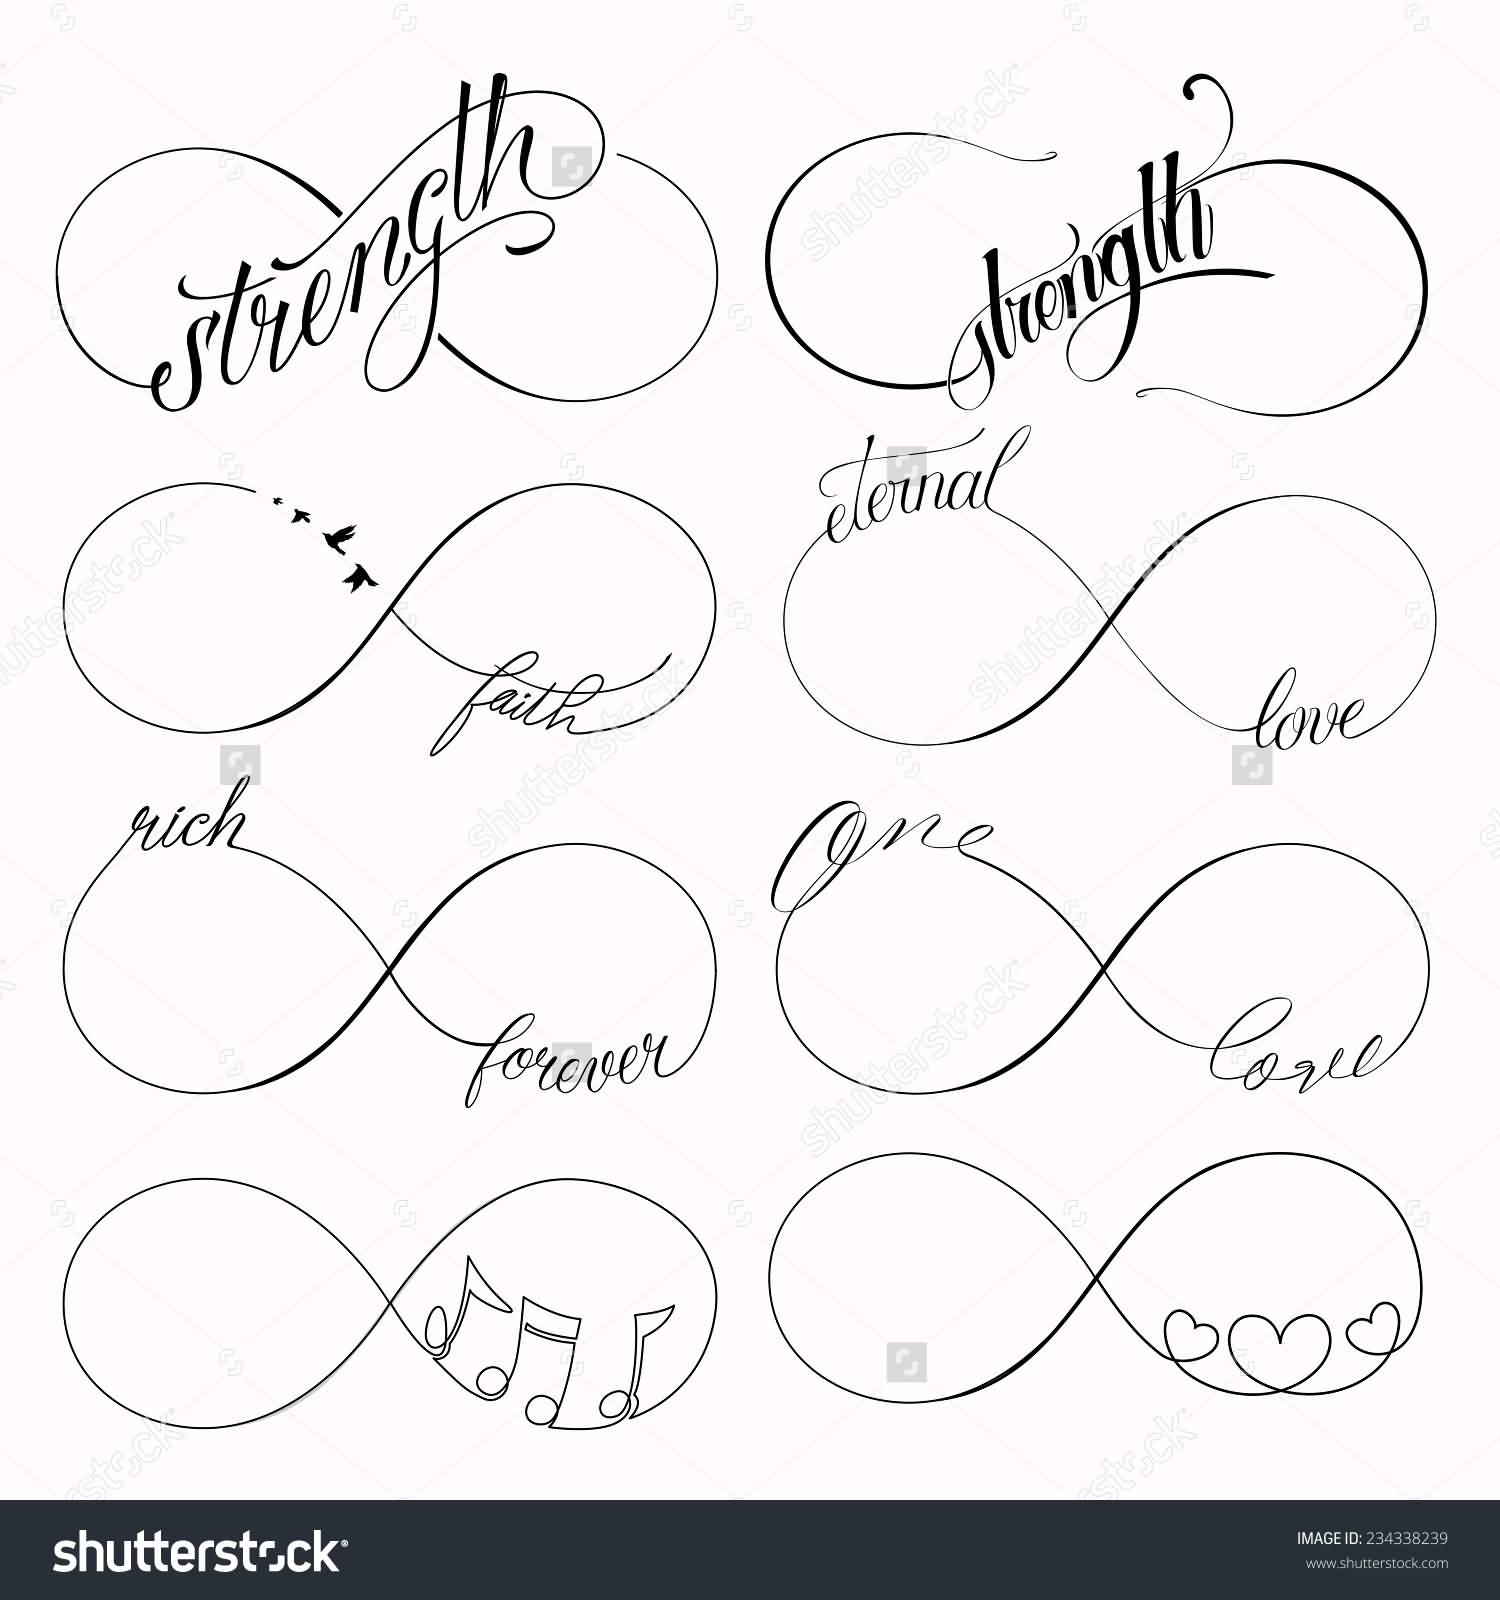 55 infinity symbol tattoo designs popular infinity symbols tattoo design biocorpaavc Images